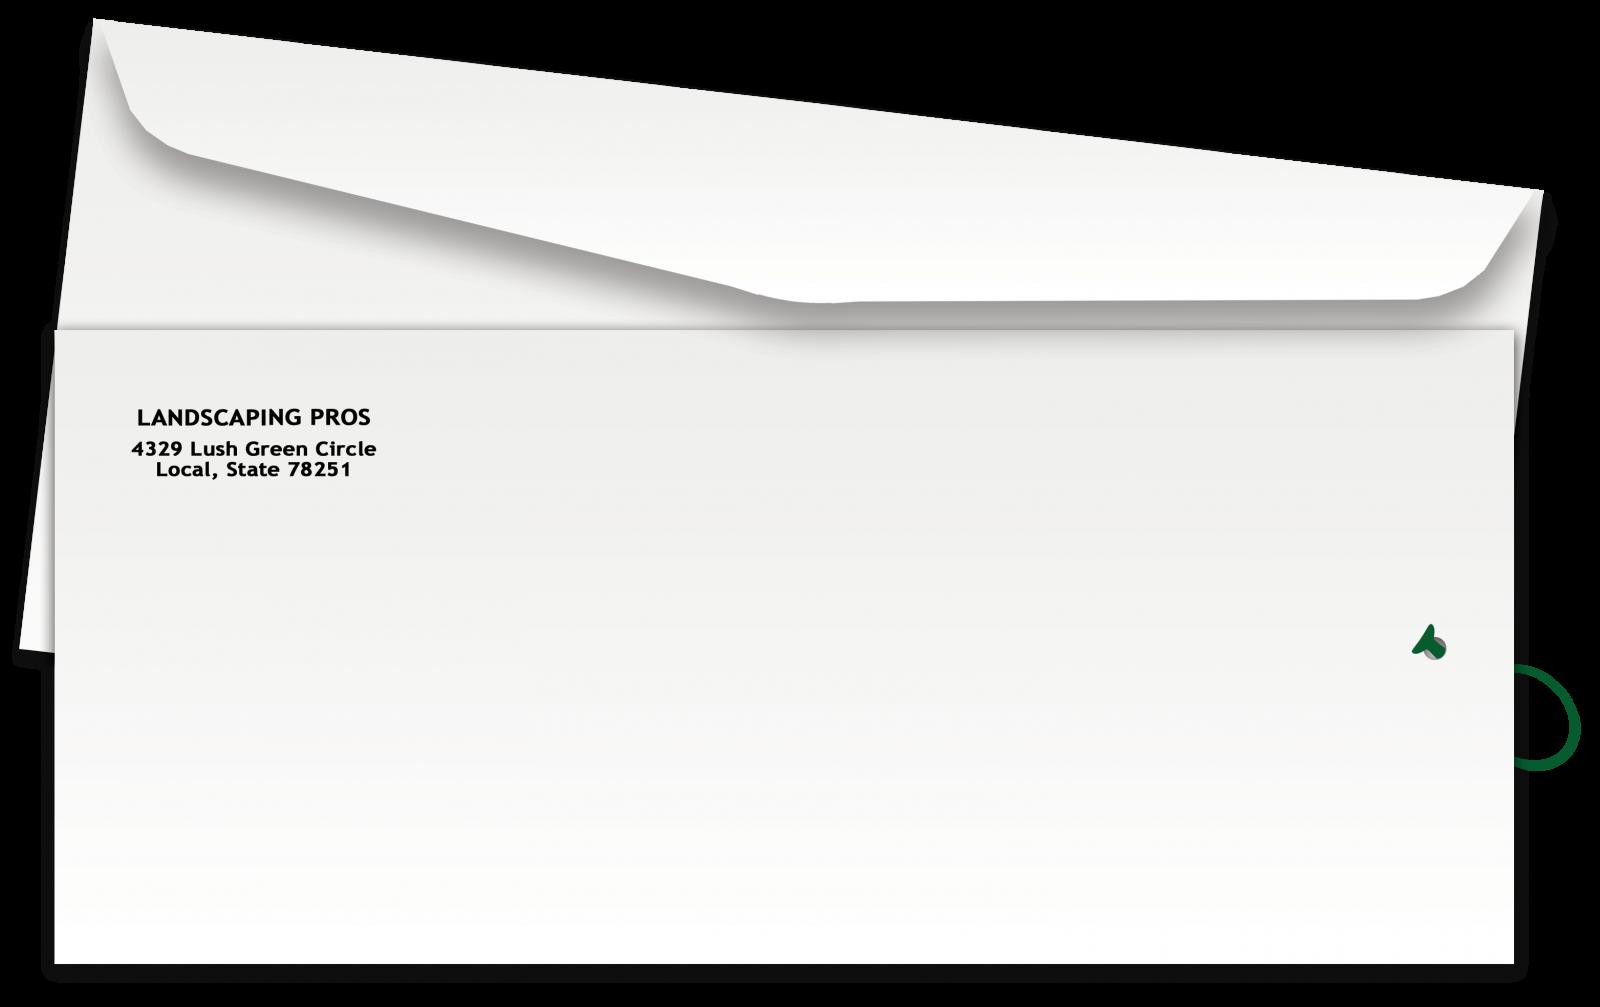 Door hangers envelopes hanger. Mail clipart addressed envelope